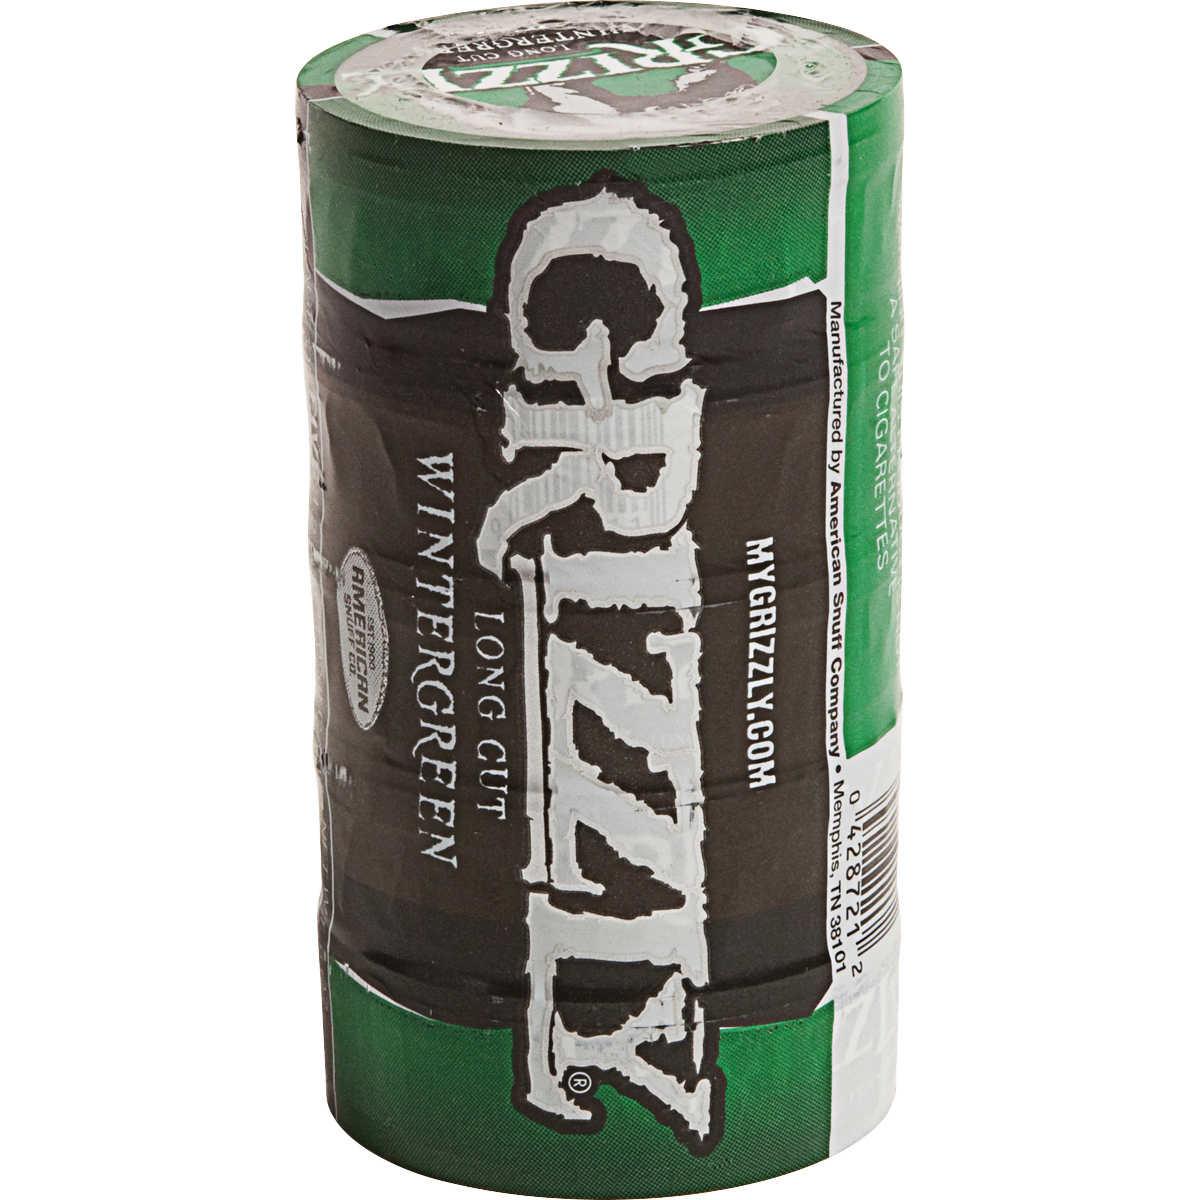 Grizzly Long Cut Smokeless Tobacco Wintergreen 1 2 Oz 5 Ct